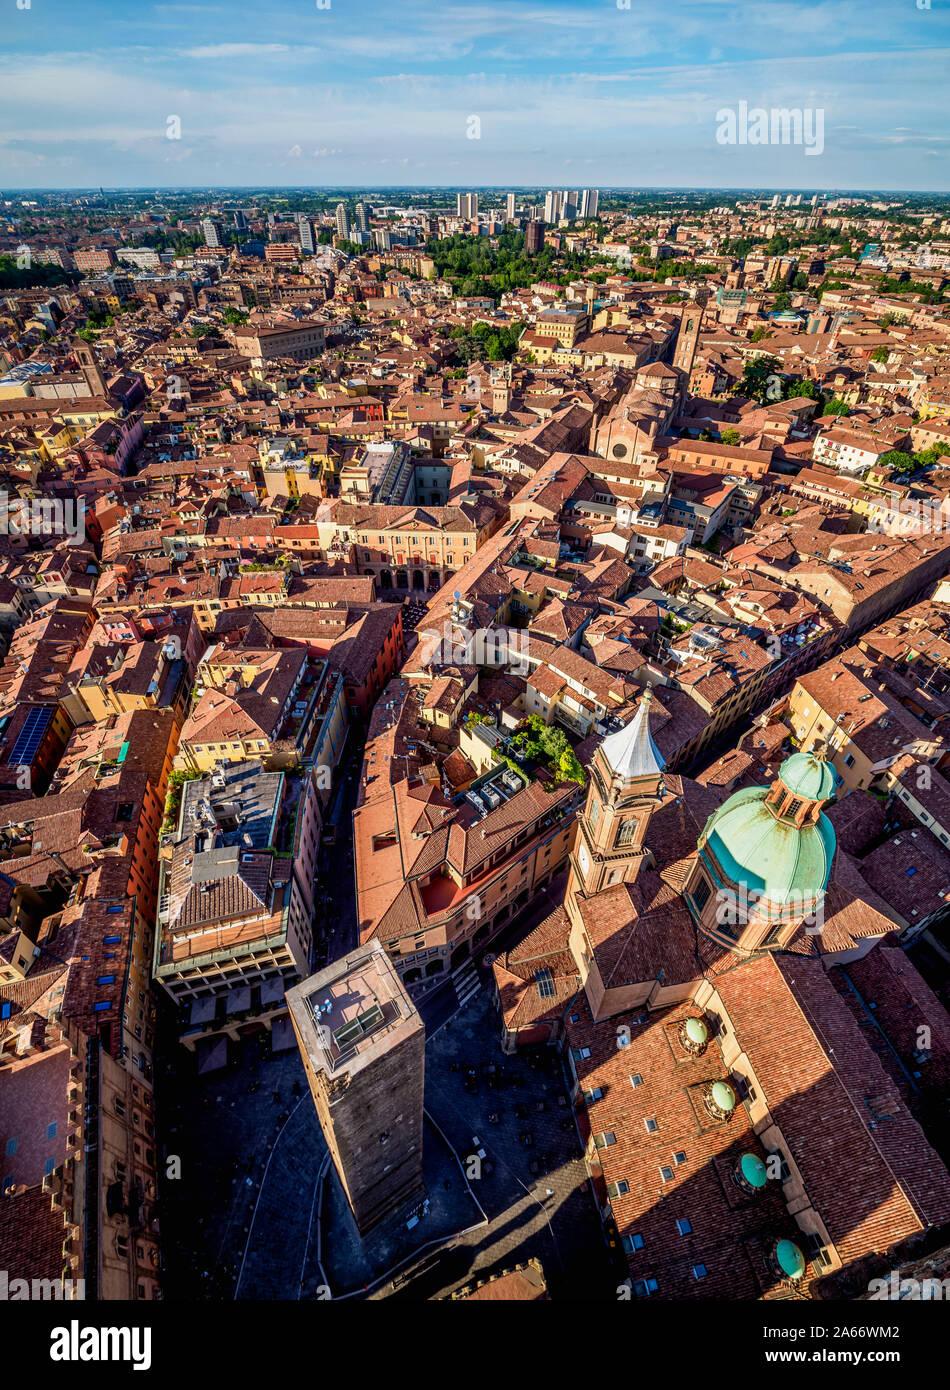 Santi Bartolomeo e Gaetano Church and Garisenda Tower, elevated view, Bologna, Emilia-Romagna, Italy Stock Photo